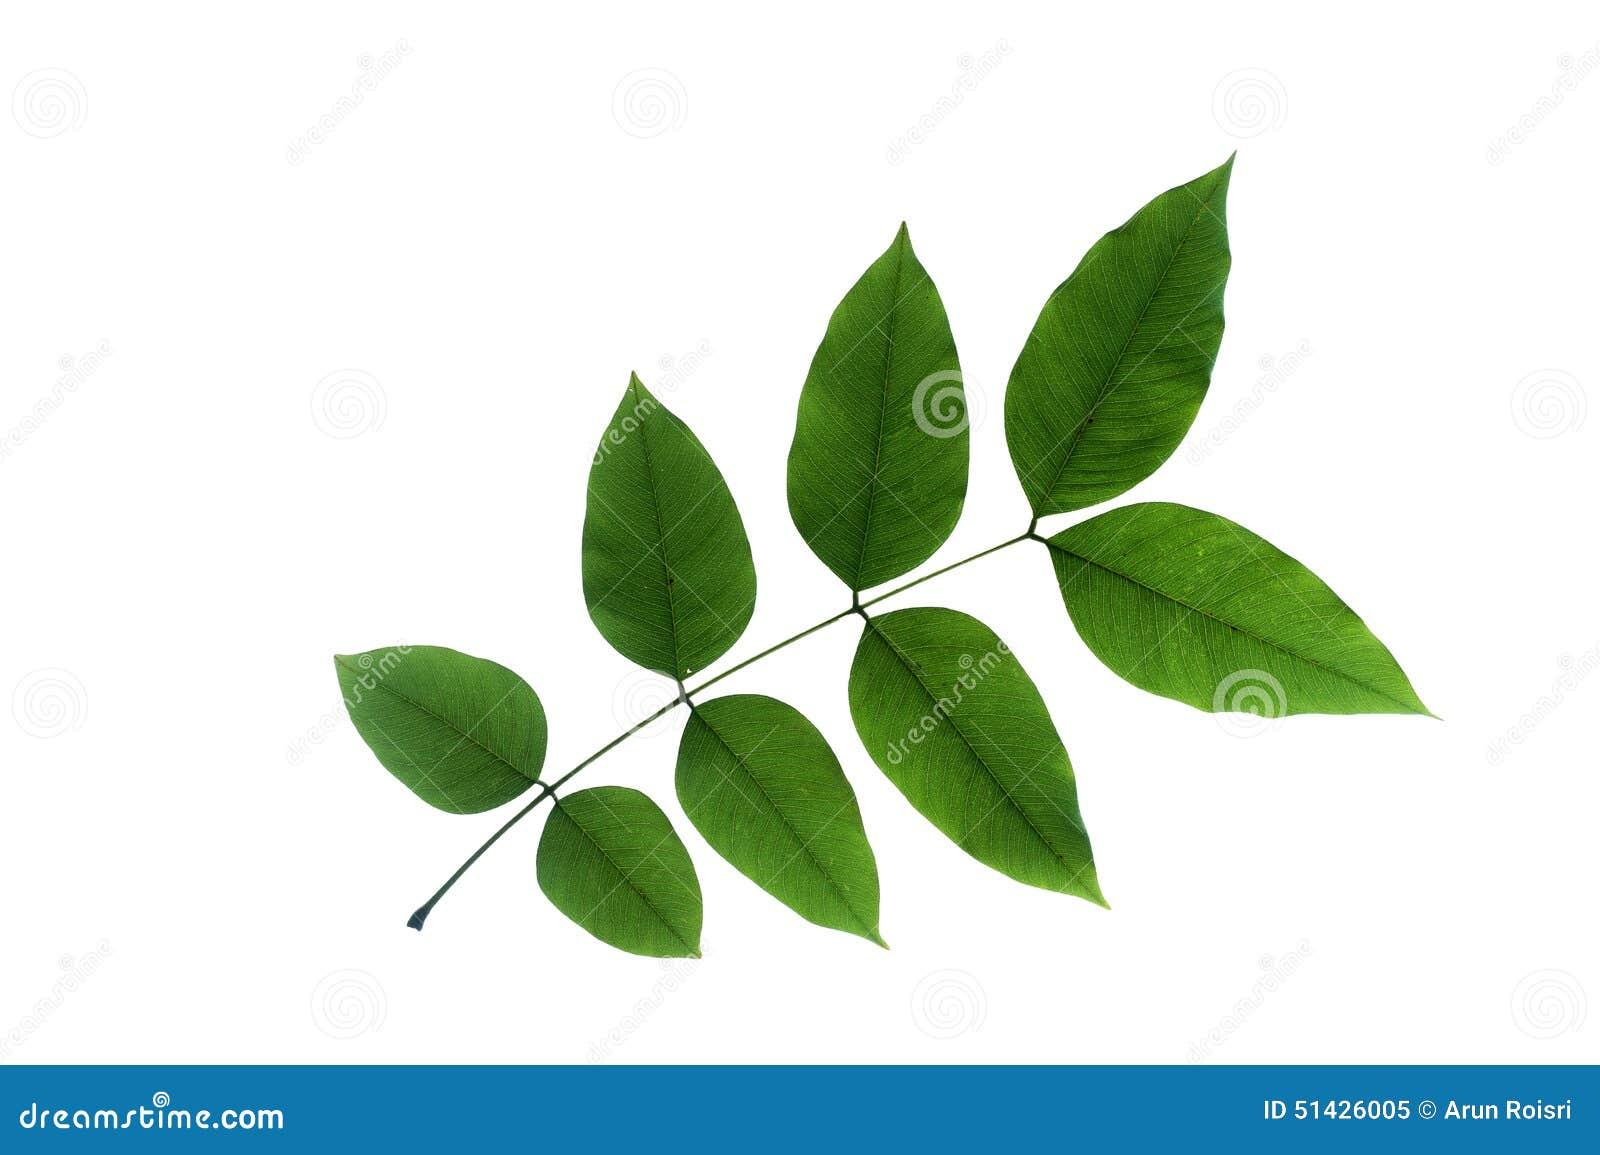 (Cassia Fistula L.), Leaf Form And Texture Stock Photo